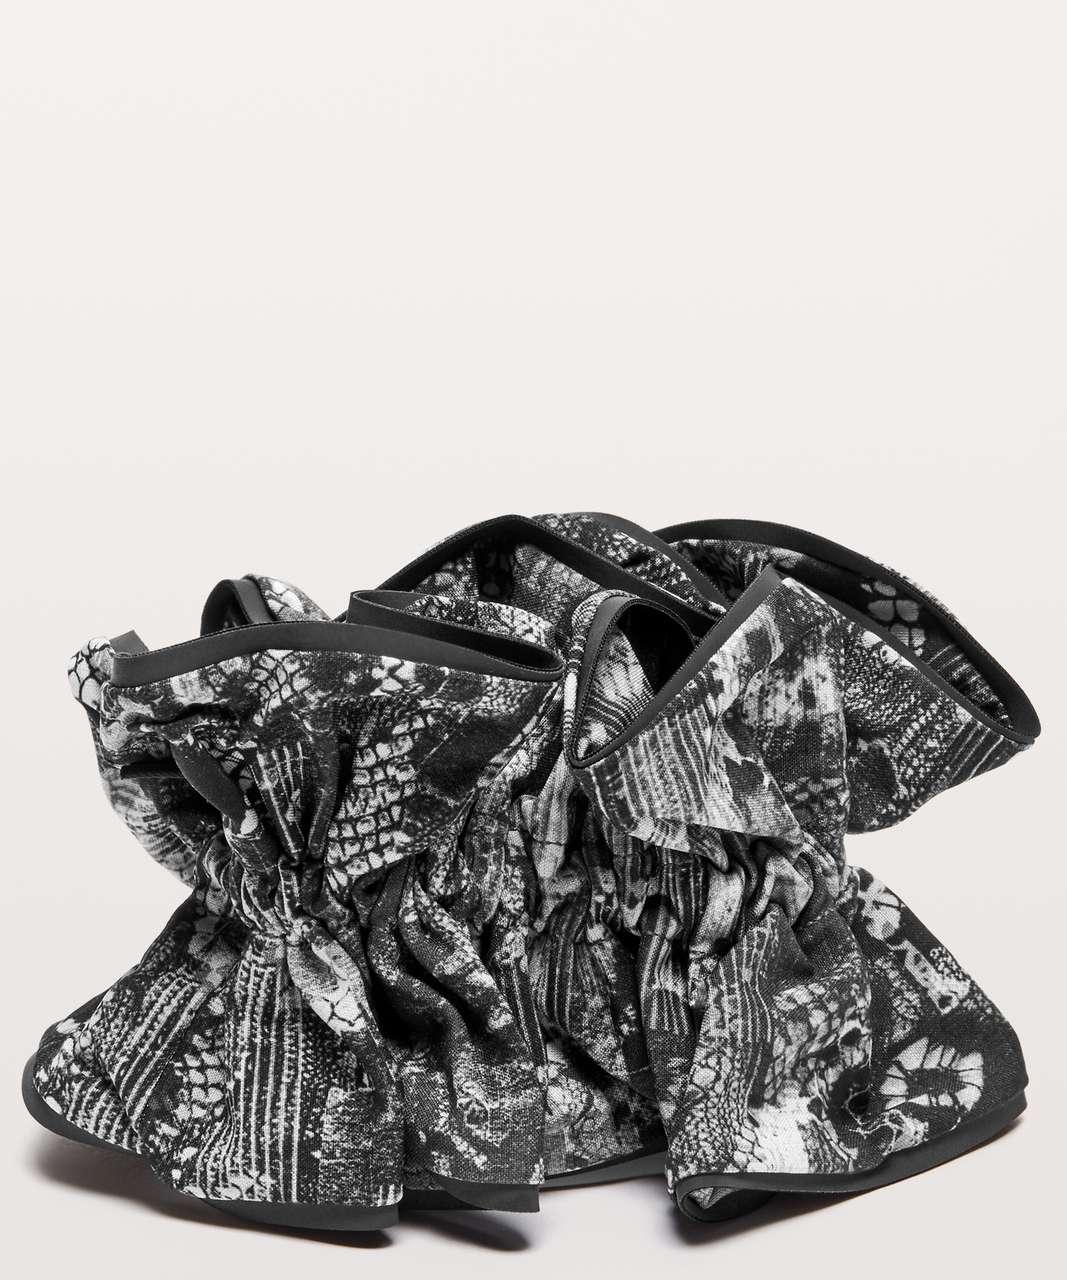 Lululemon Light Locks Scrunchie - Masked Lace Starlight Black